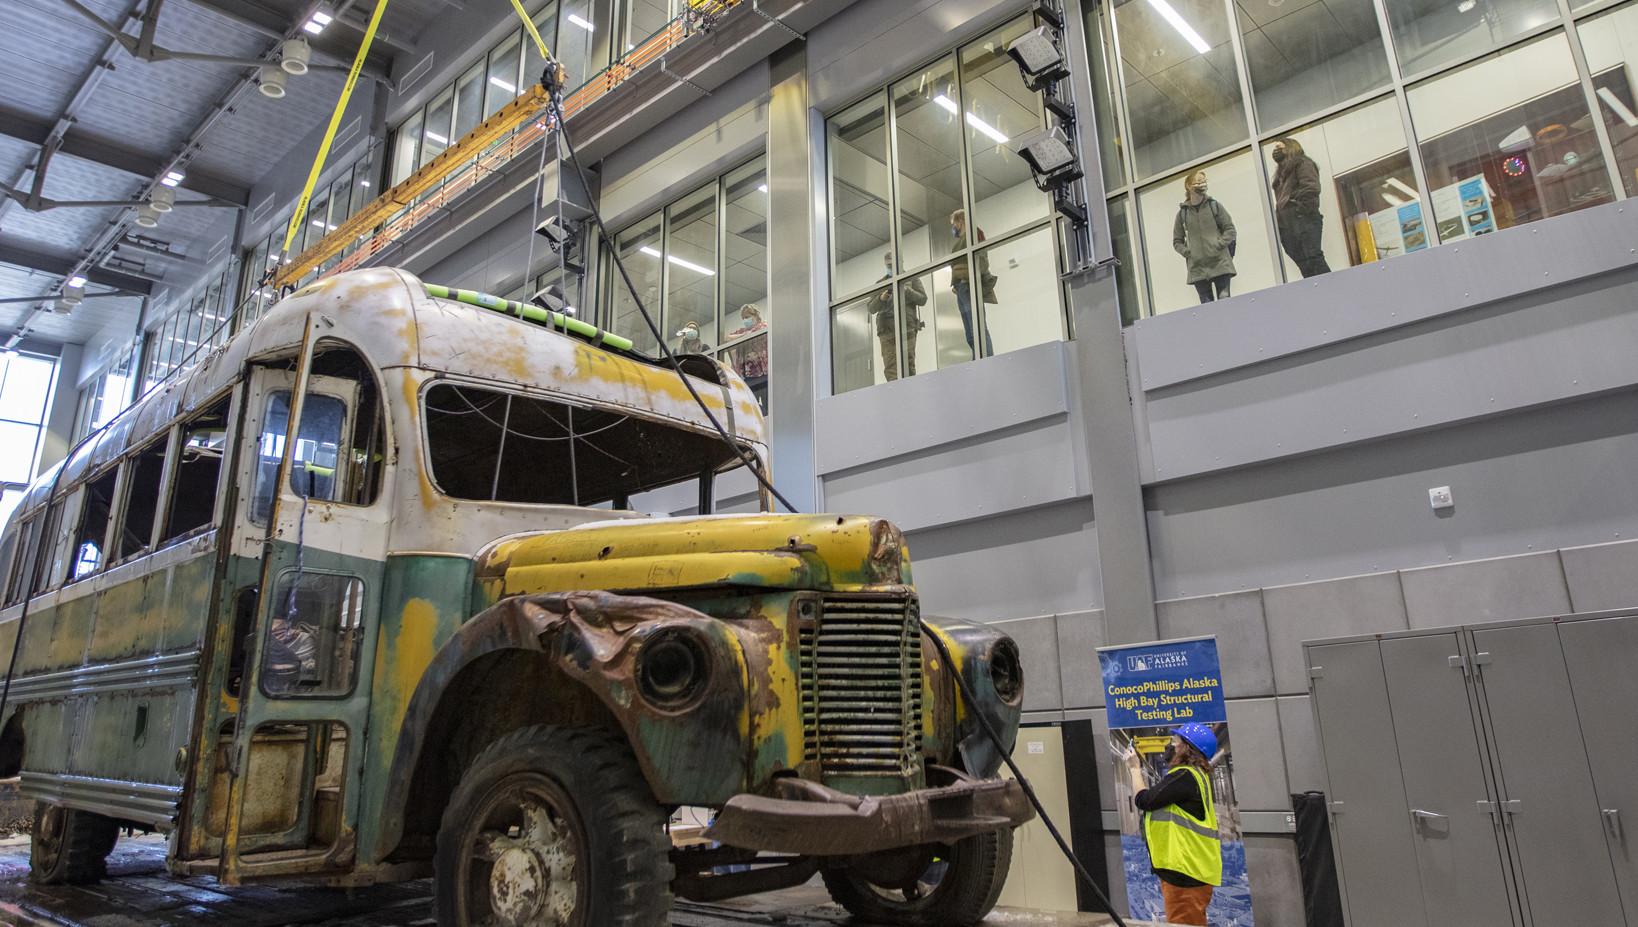 Bus 142 in UAF Engineering Building for conservation work